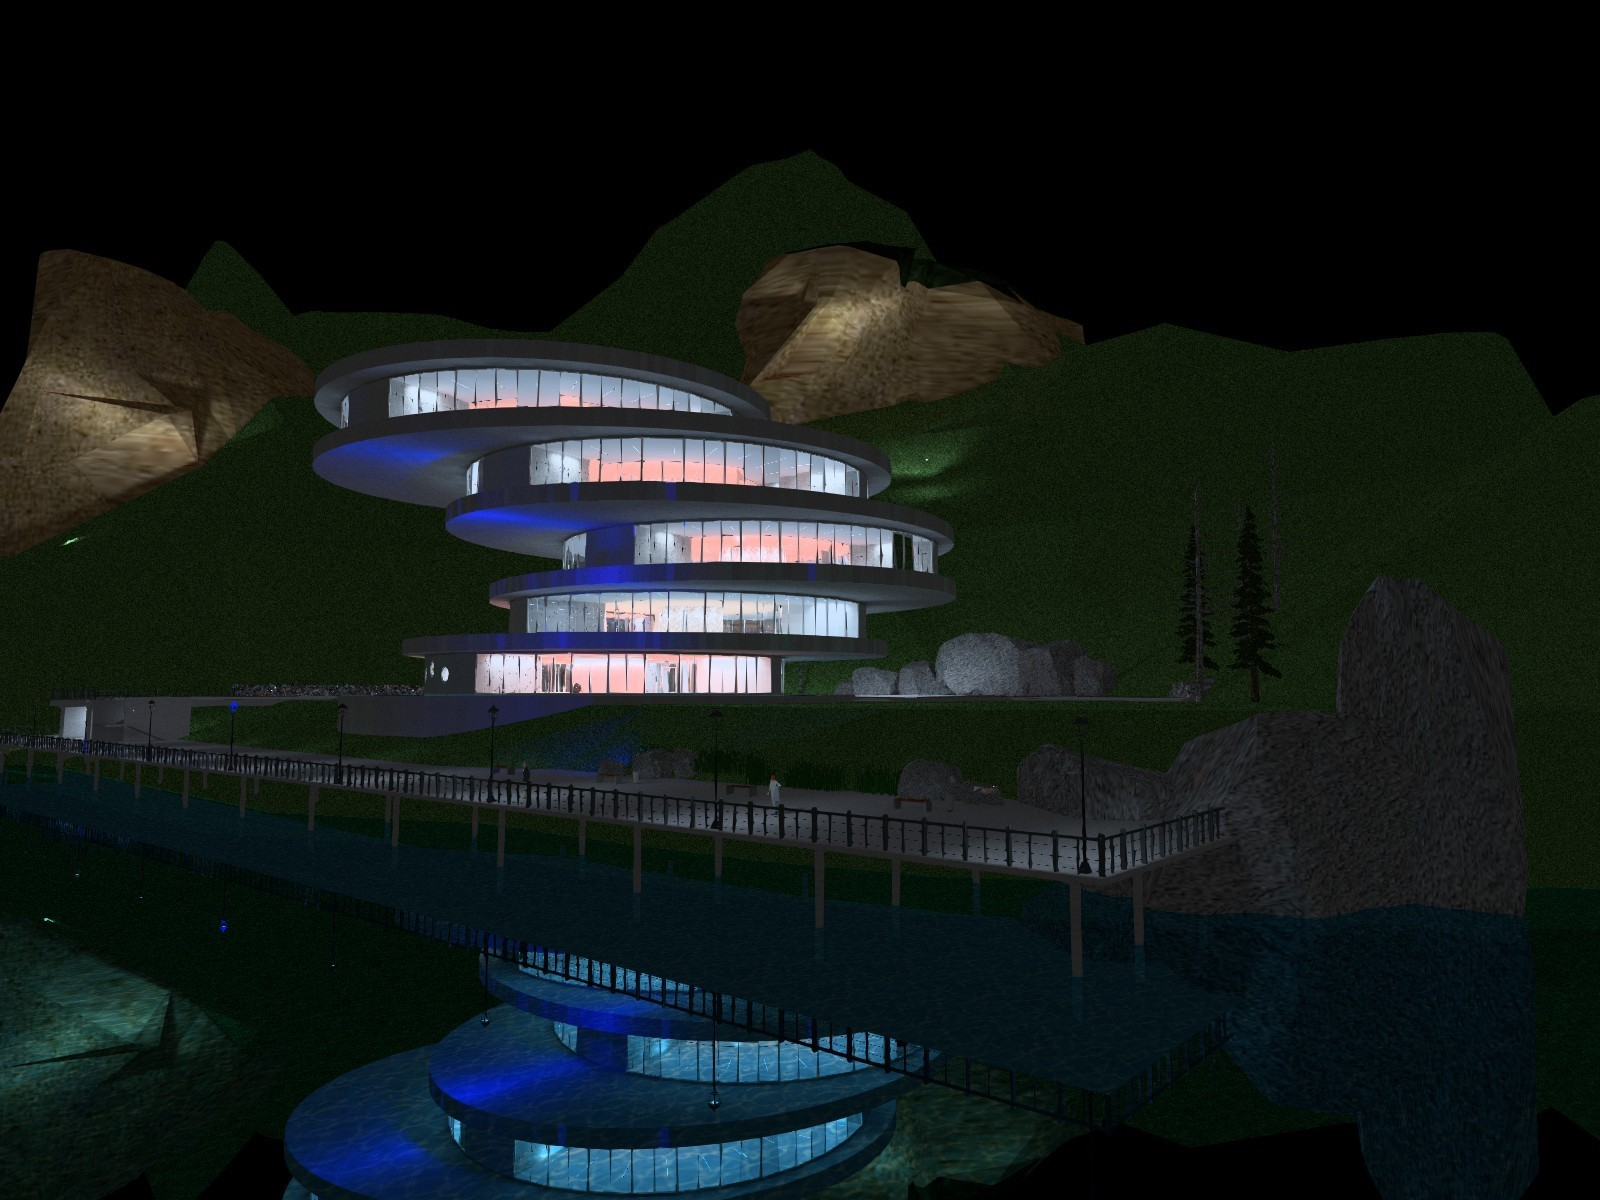 Oculus Bldg. image 7